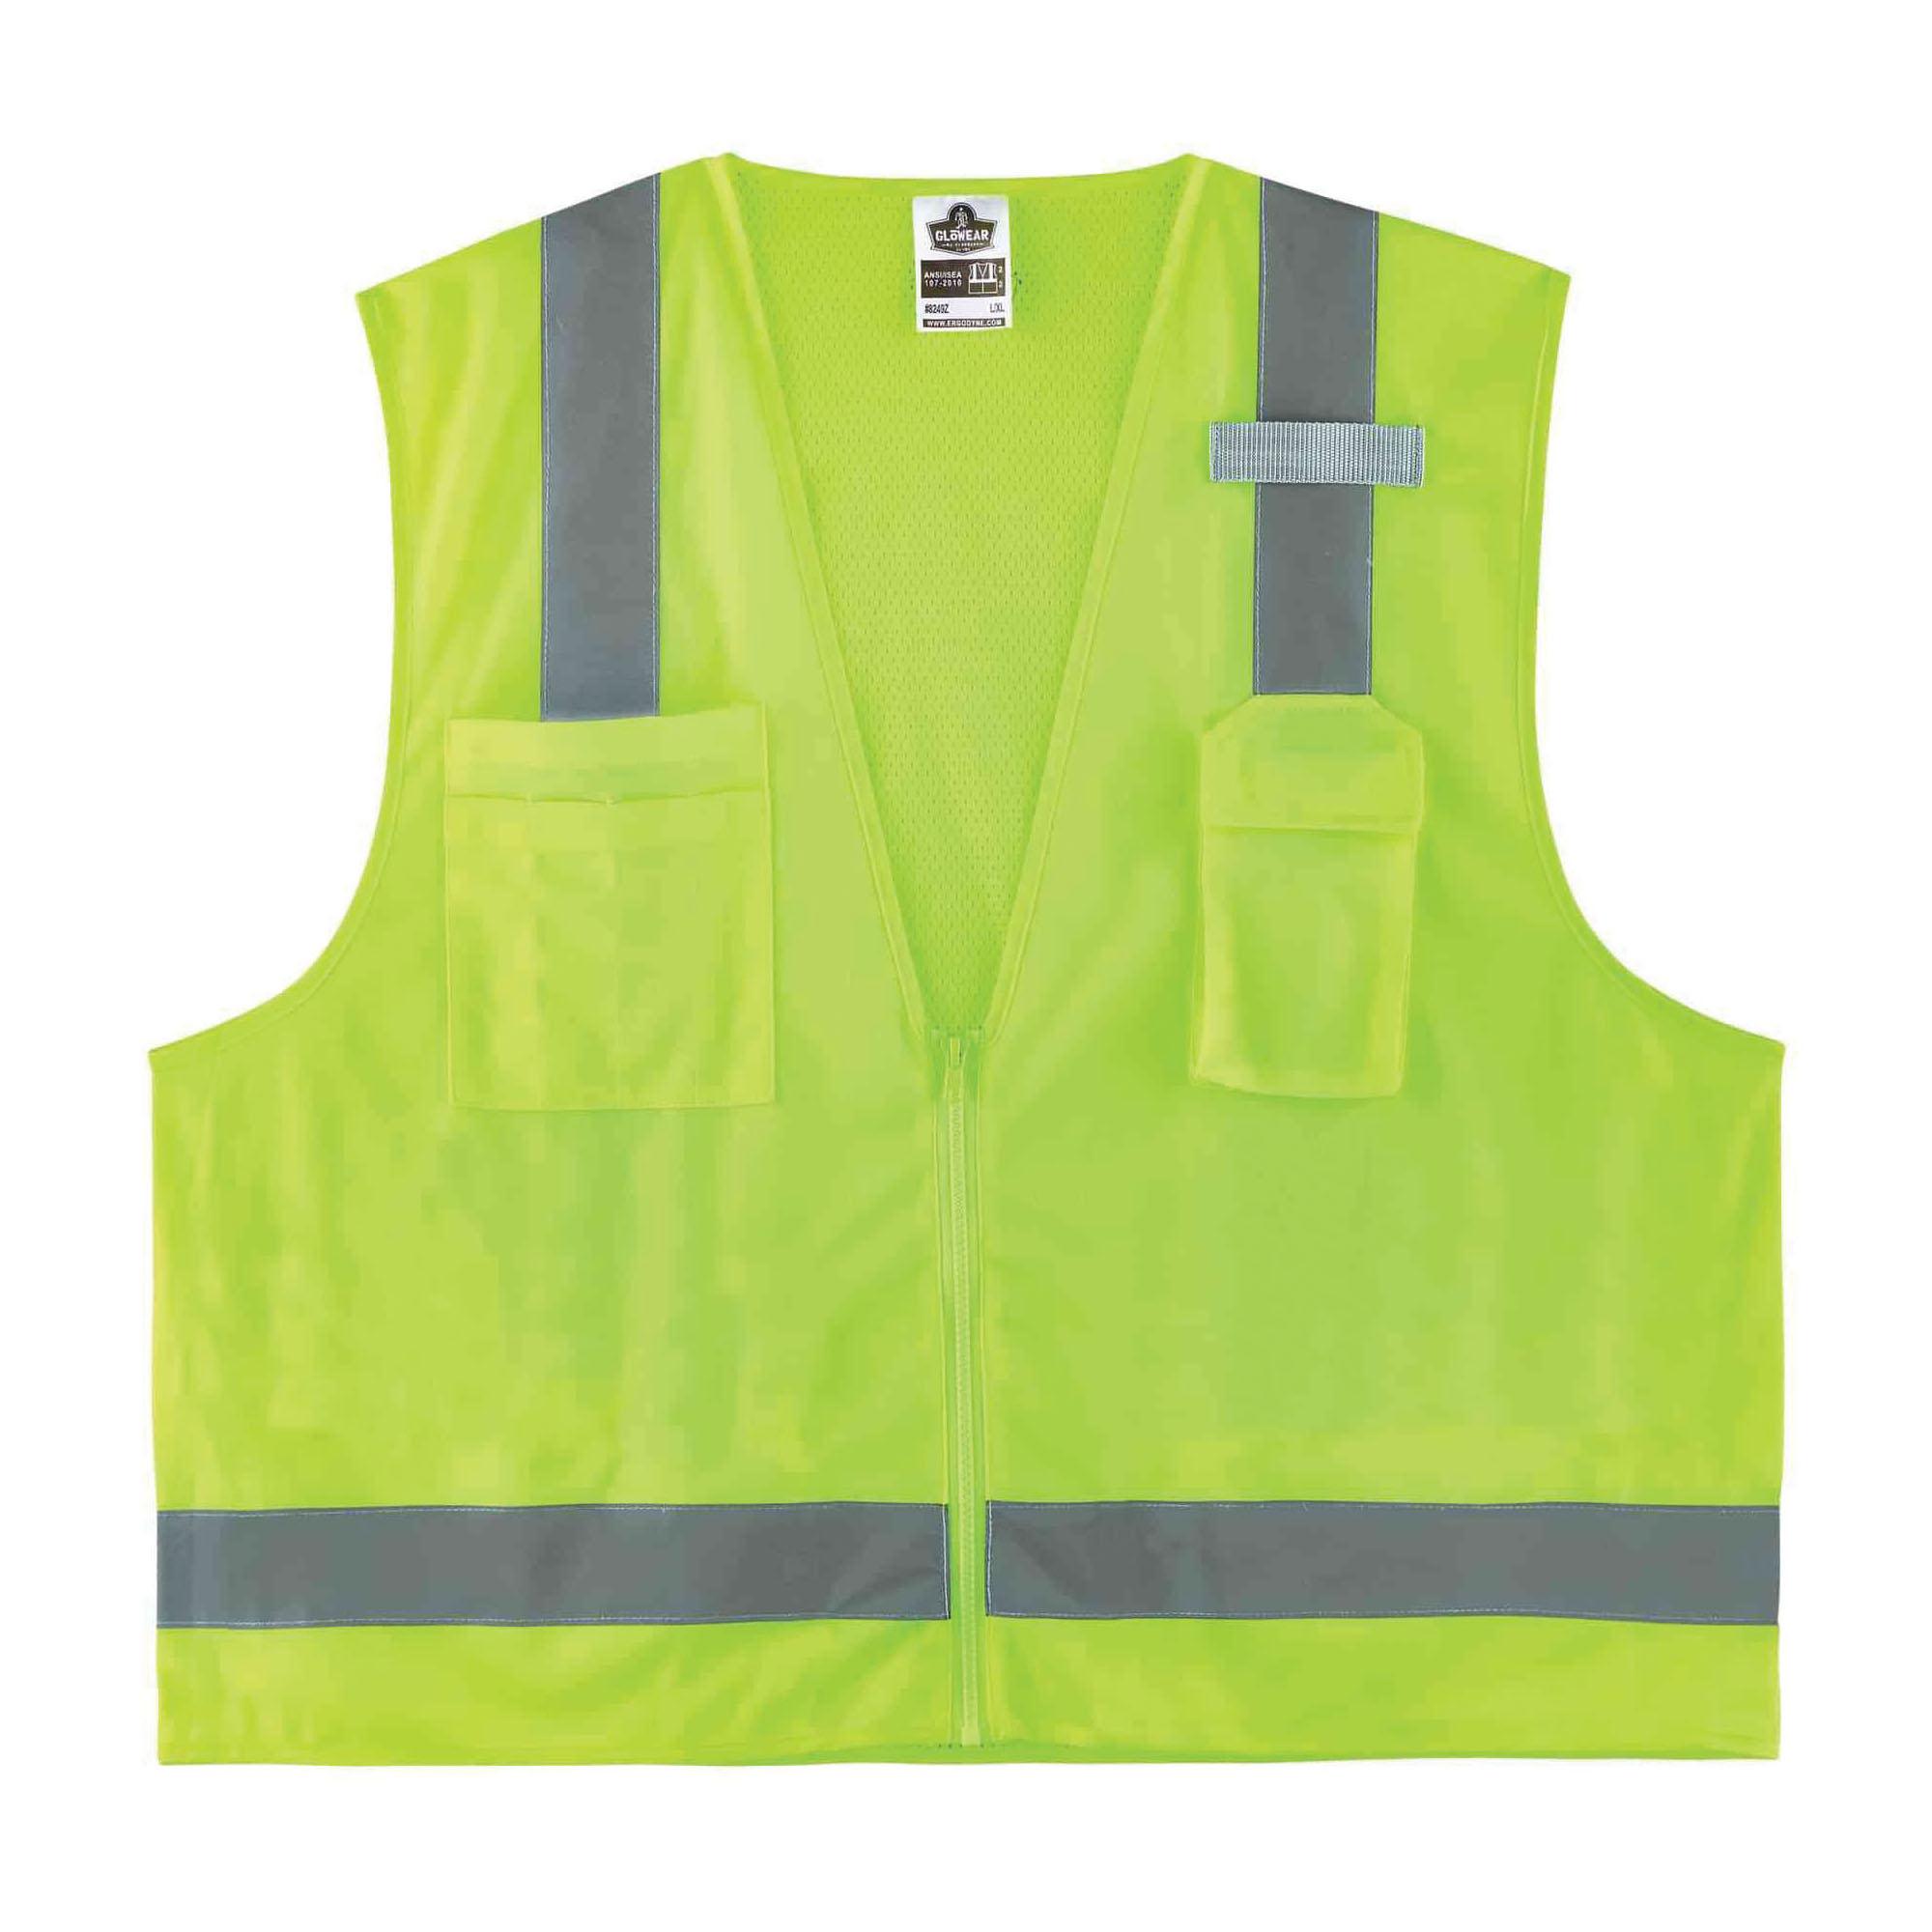 Ergodyne® GloWear® 8249Z Economy Surveyor Safety Vest, Hi-Viz Lime, Polyester Mesh/Solid, Zipper Closure, 4 Pockets, ANSI Class: Class 2, ANSI/ISEA 107-2015 Type R